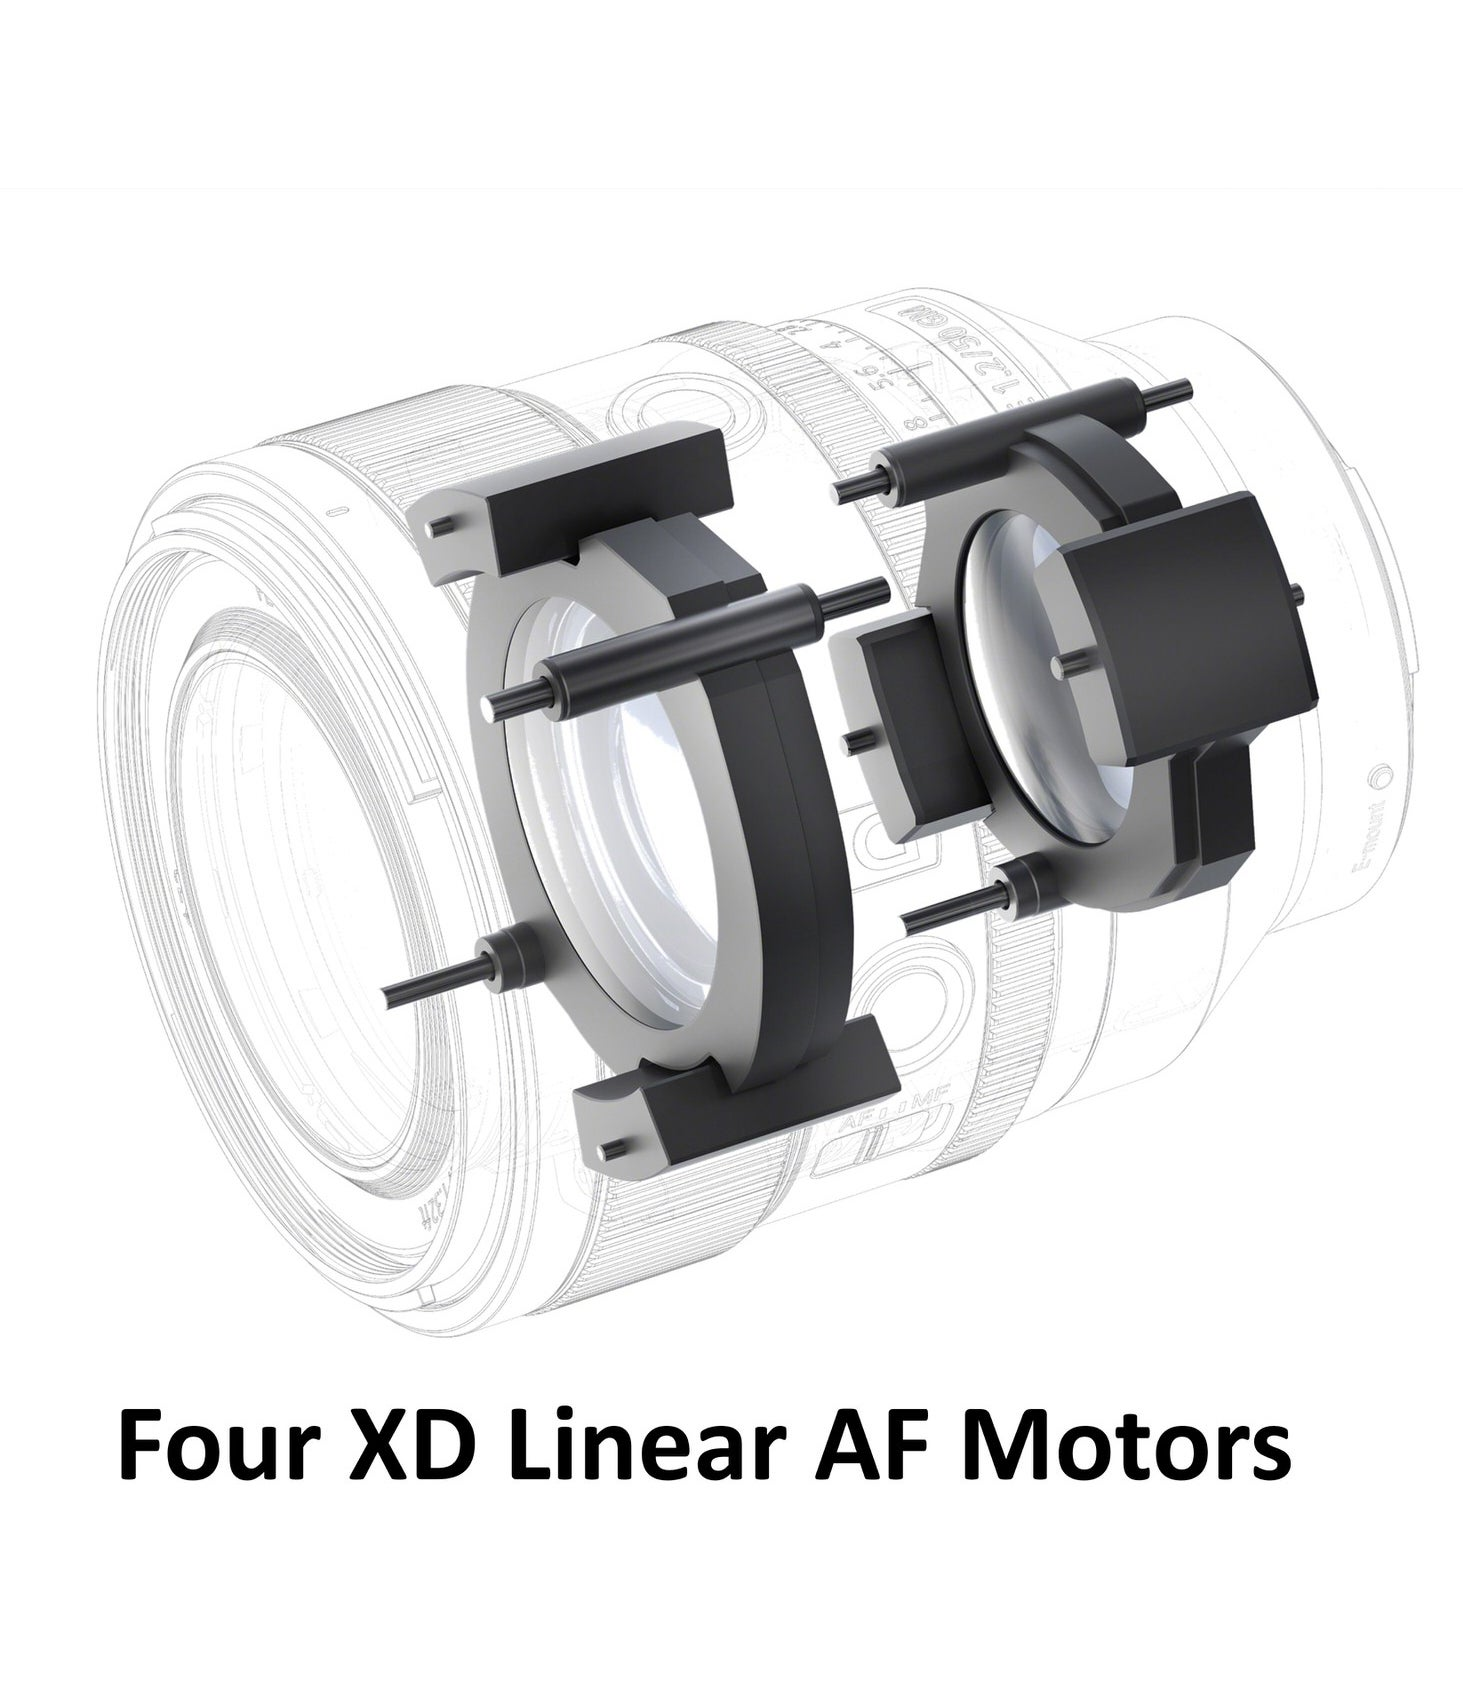 Sony-50mm-F12-GM-SEL50F12GM----XD-Linear-Motors-2.jpg